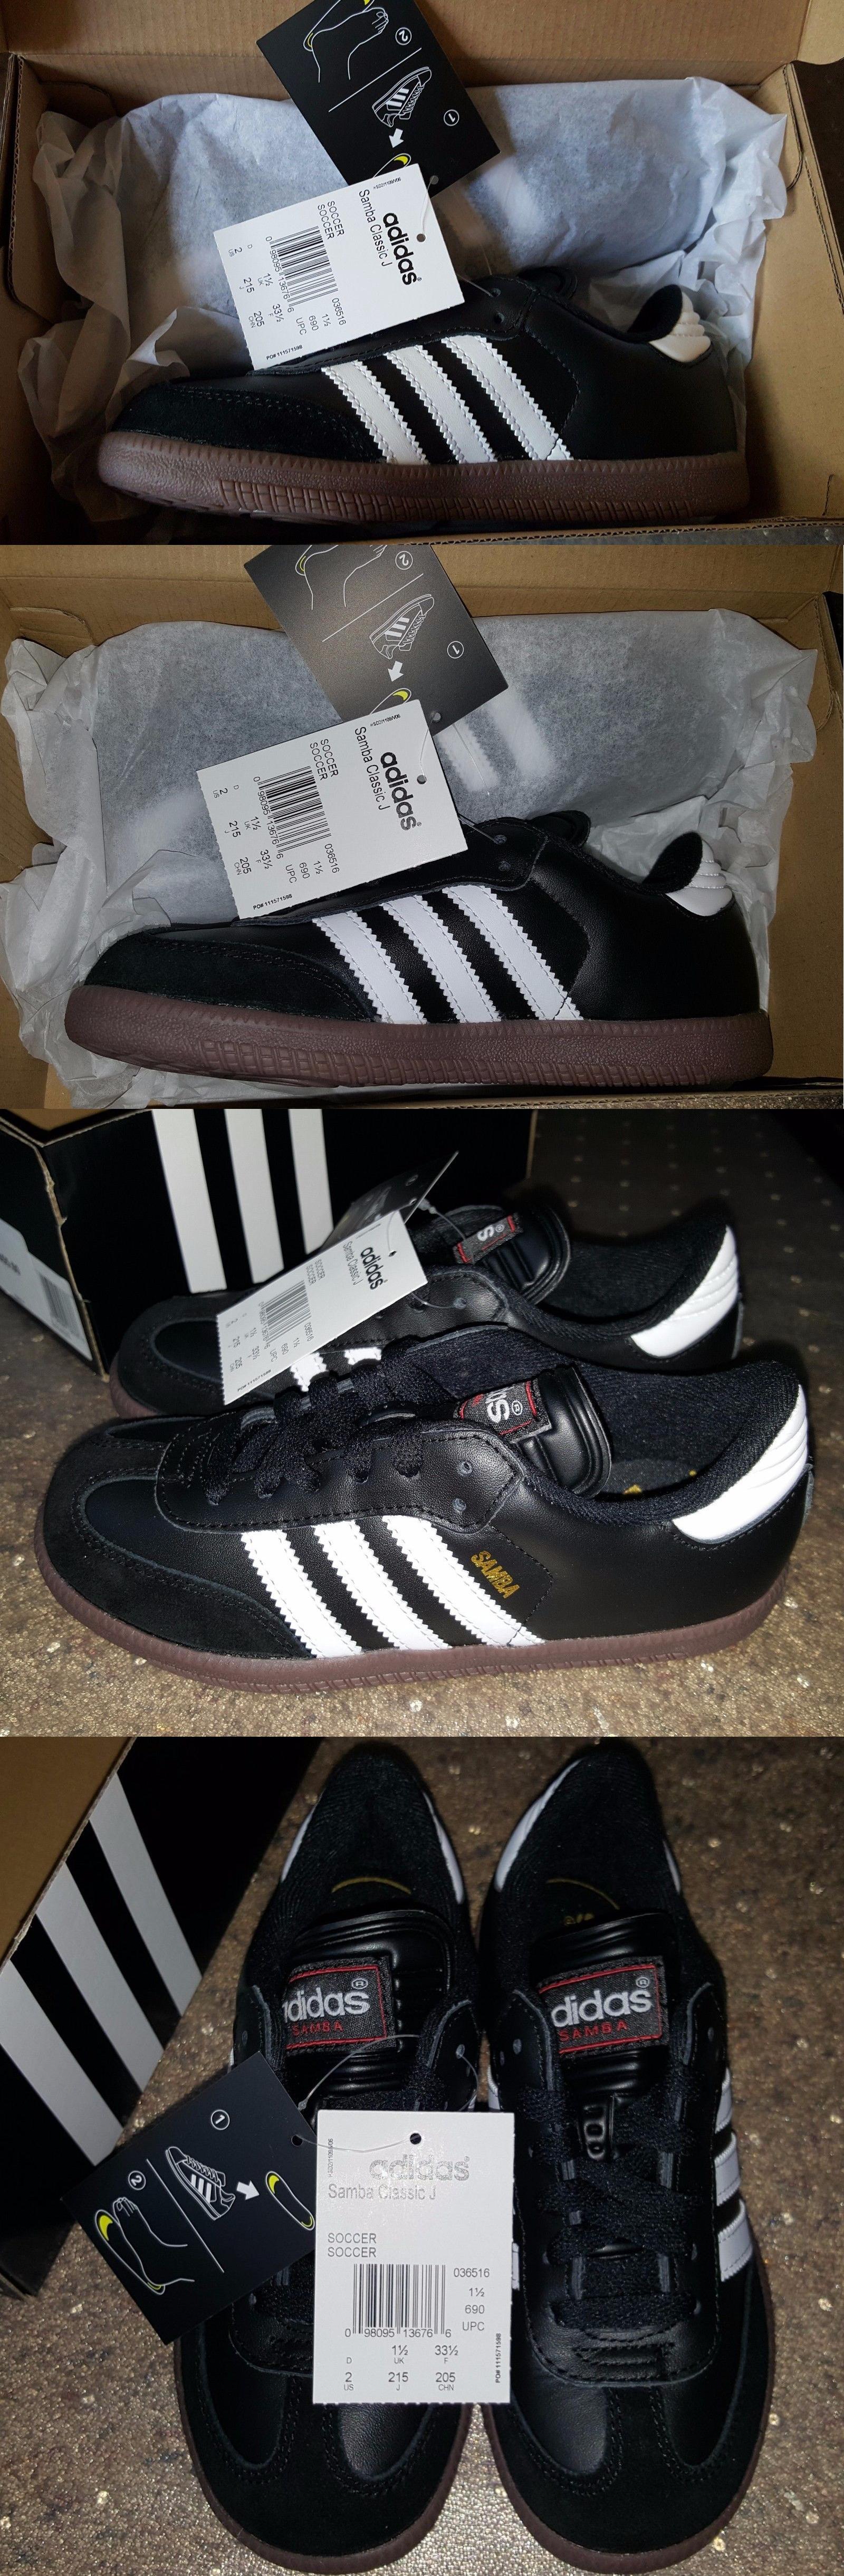 jugend 159177: adidas sambi jugend sportschuhe schwarze unisex - us - größe 2.